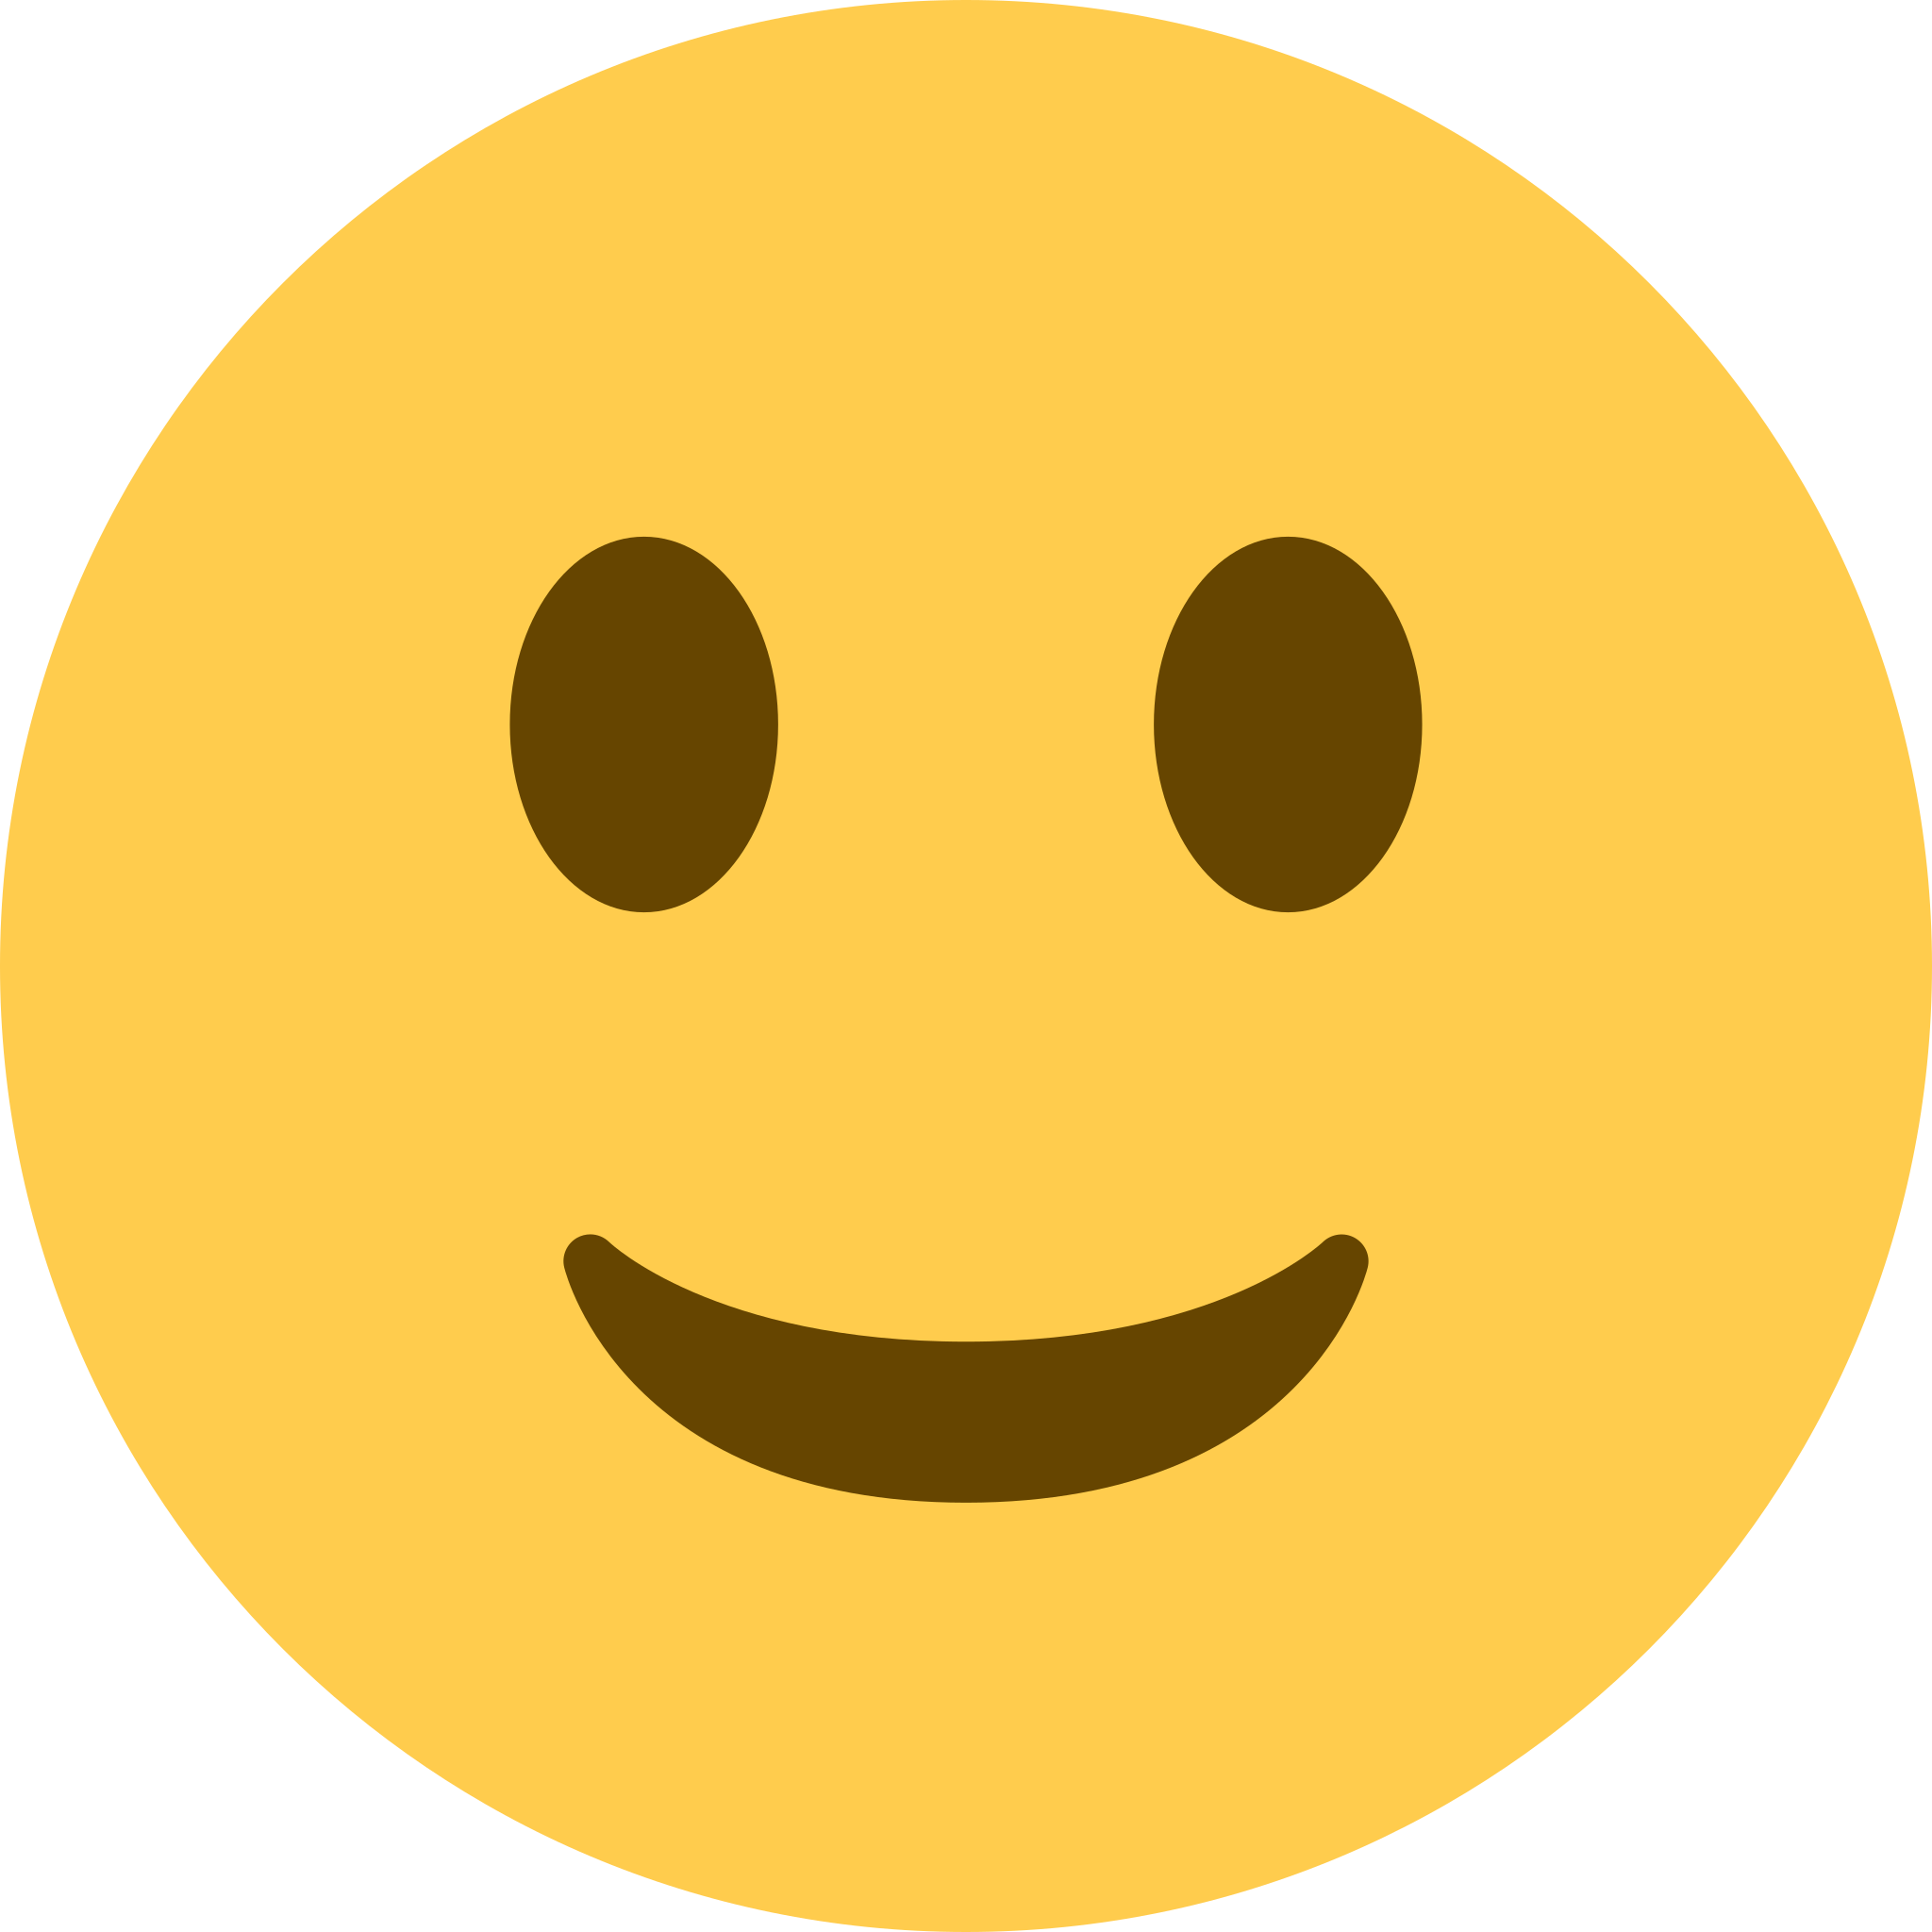 2048x2048 Pegatina denbora lerroa Slightly smiling face